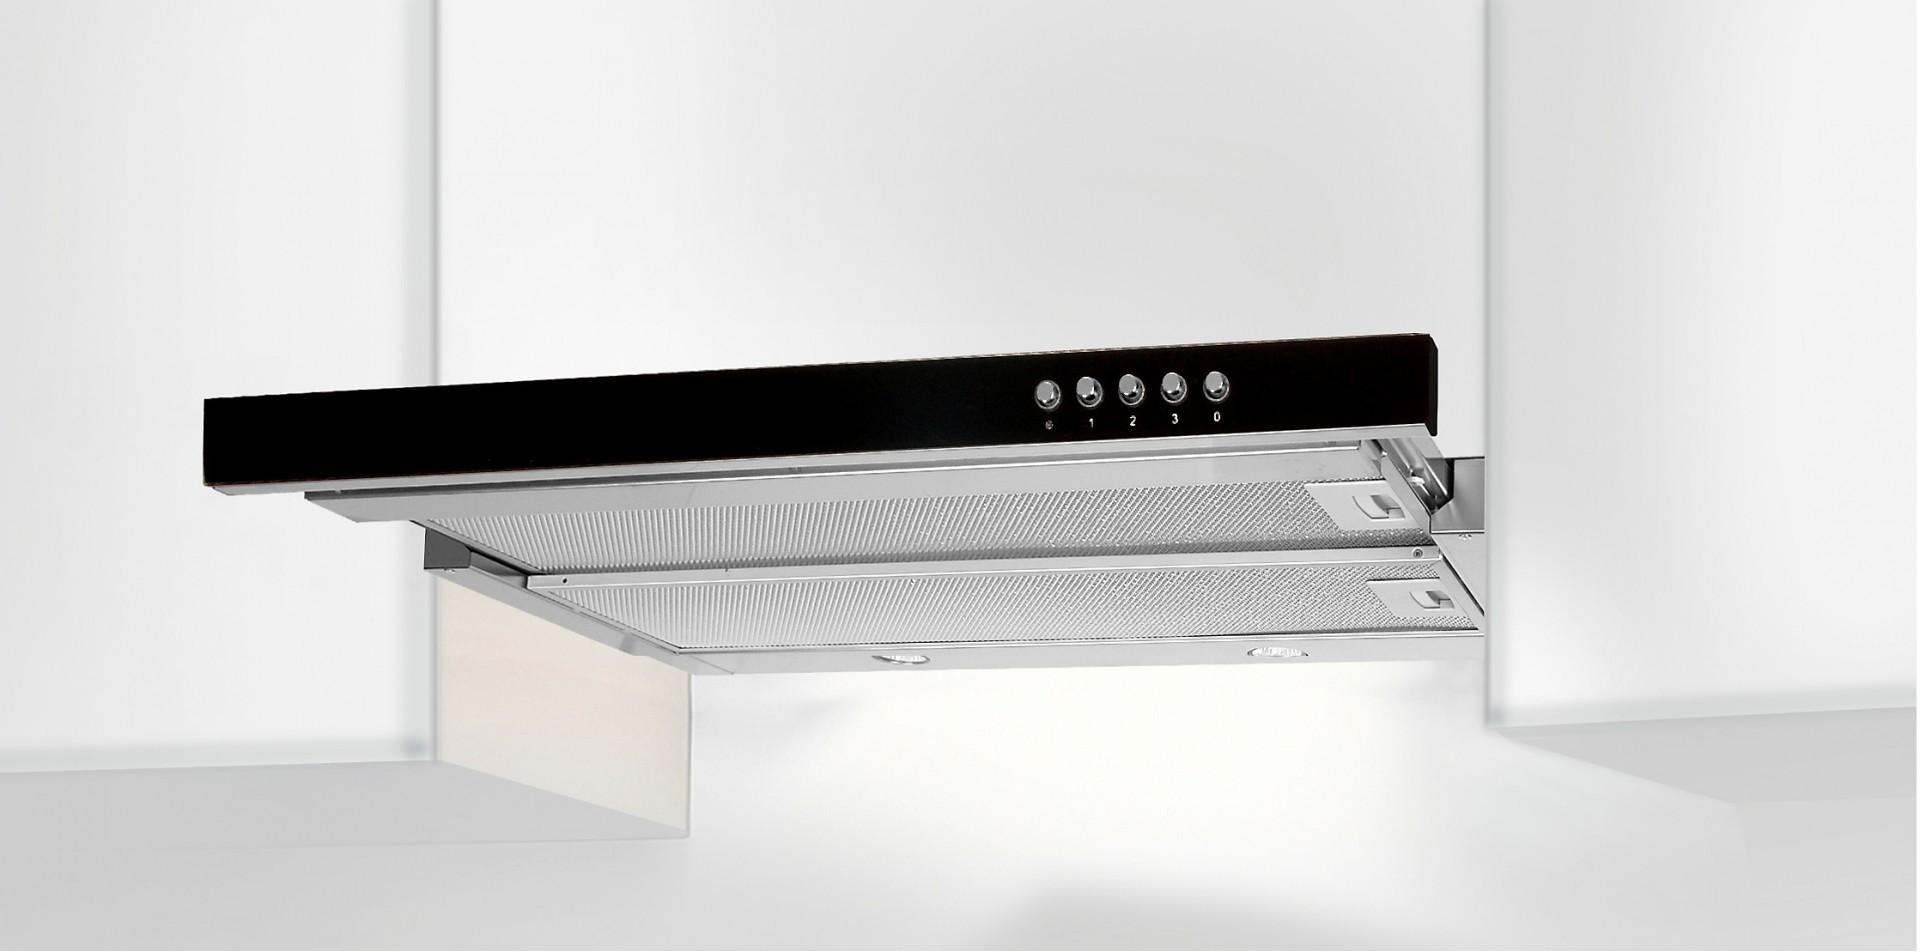 Opinie o Akpo WK-7 LIGHT GLASS 60 Inox